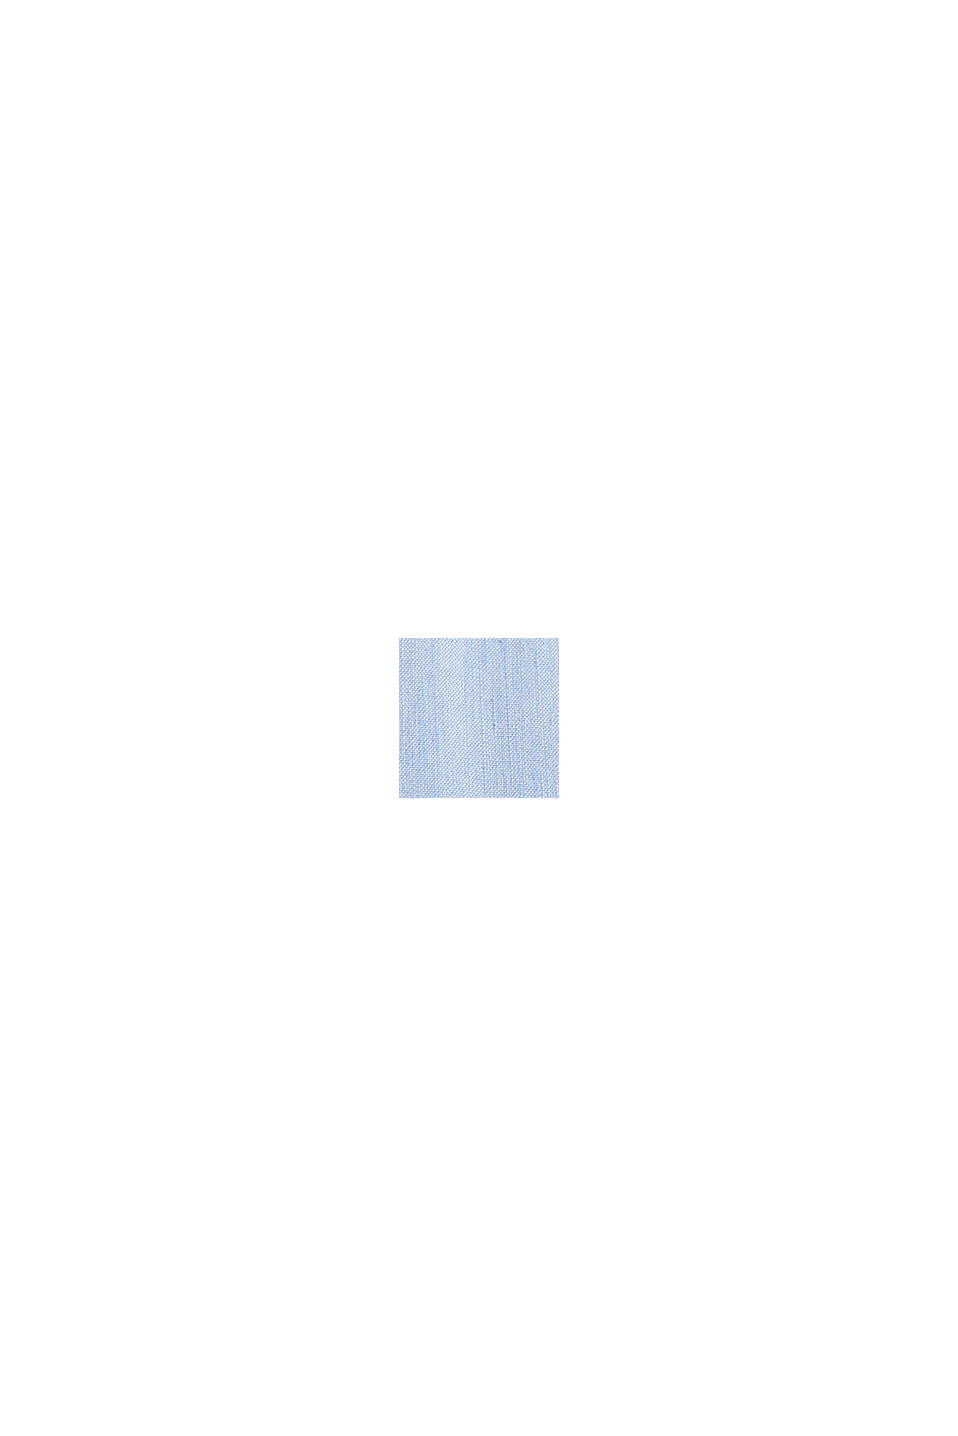 Linnemix: skjorta med ståkrage, LIGHT BLUE, swatch